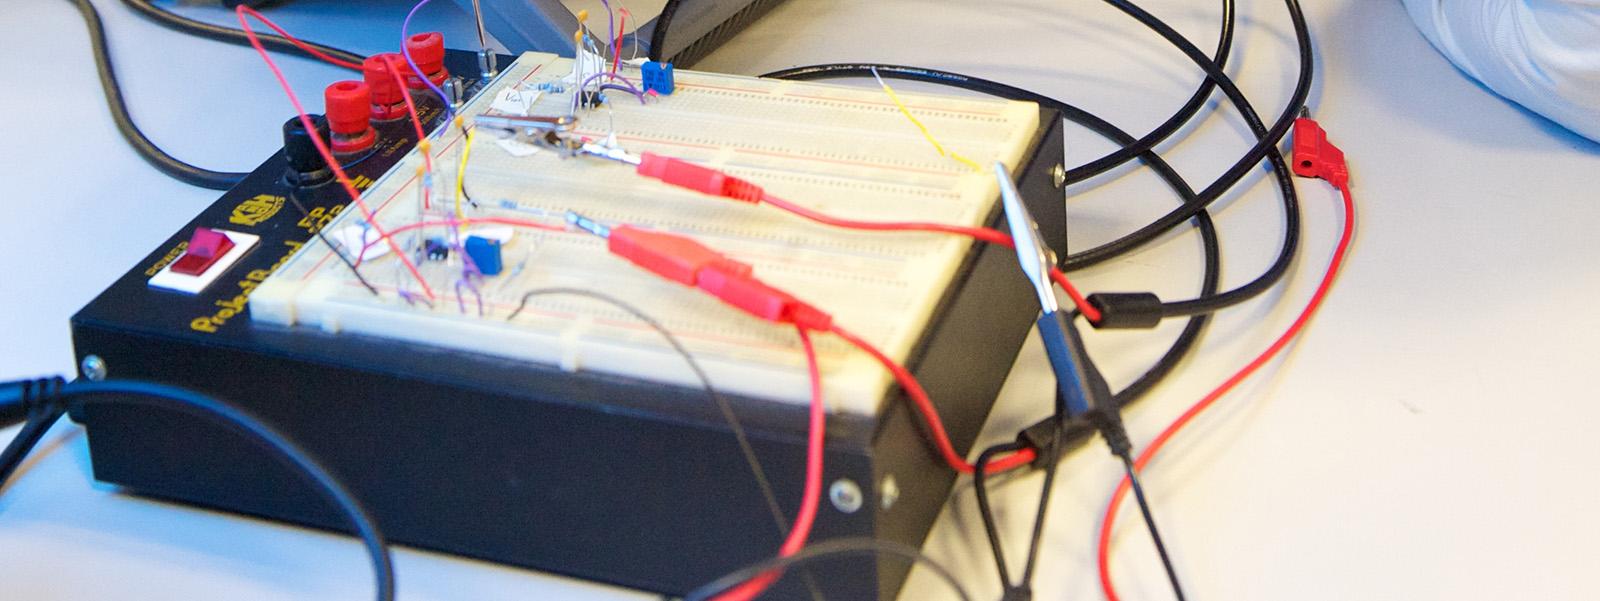 BEng Electrical & Mechanical Engineering Degree | University